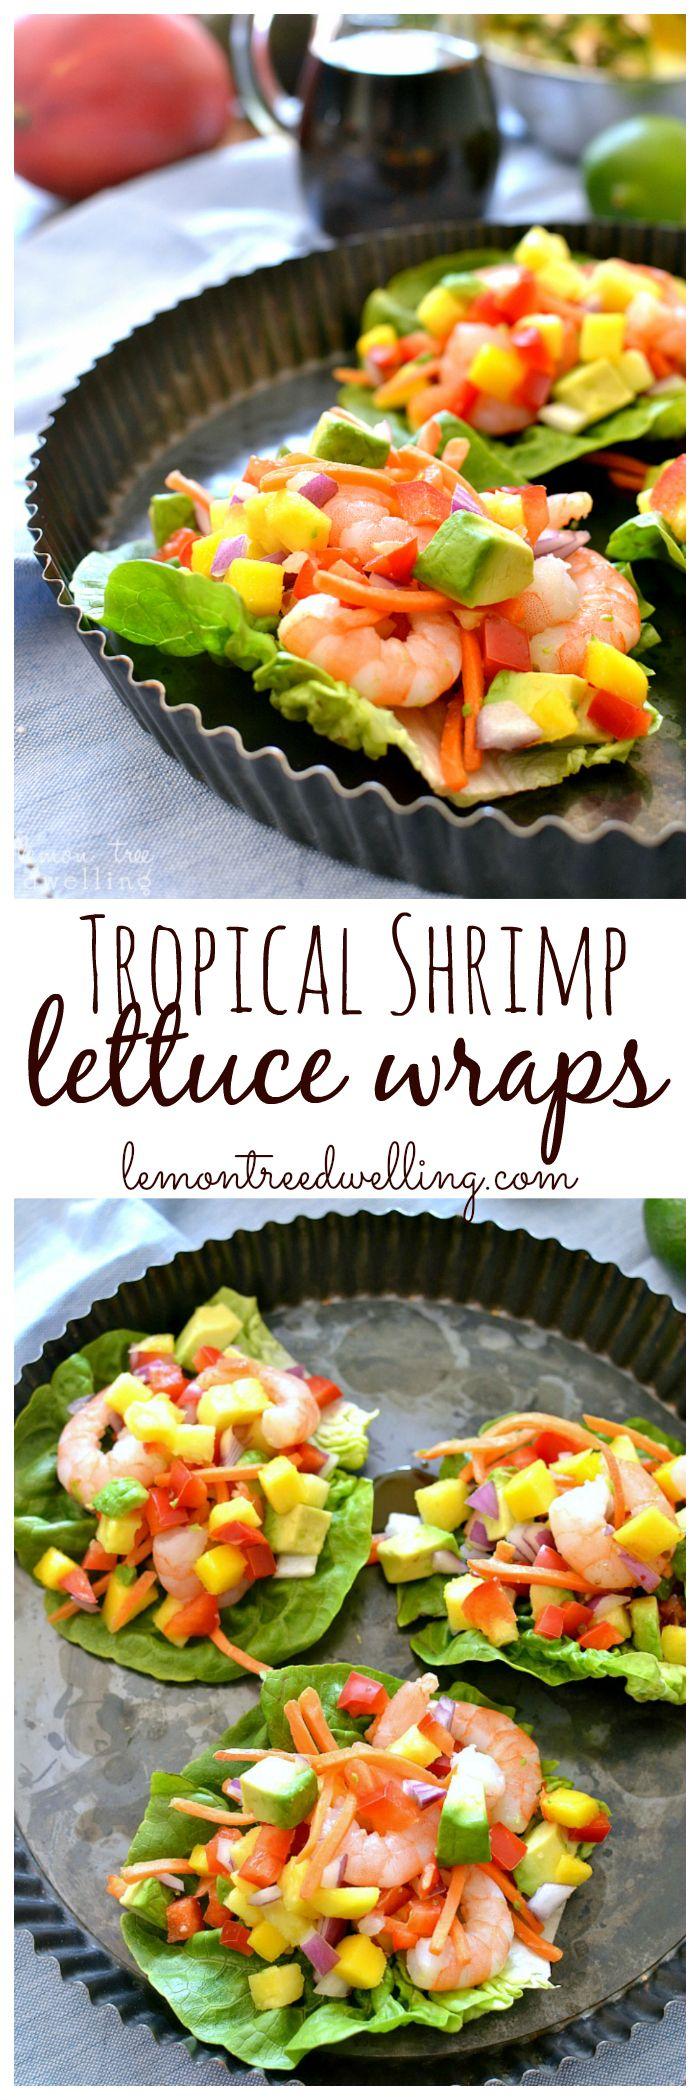 Tropical Shrimp Lettuce Wraps with Honey Lime Soyaki Sauce! #mypicknsave #ad